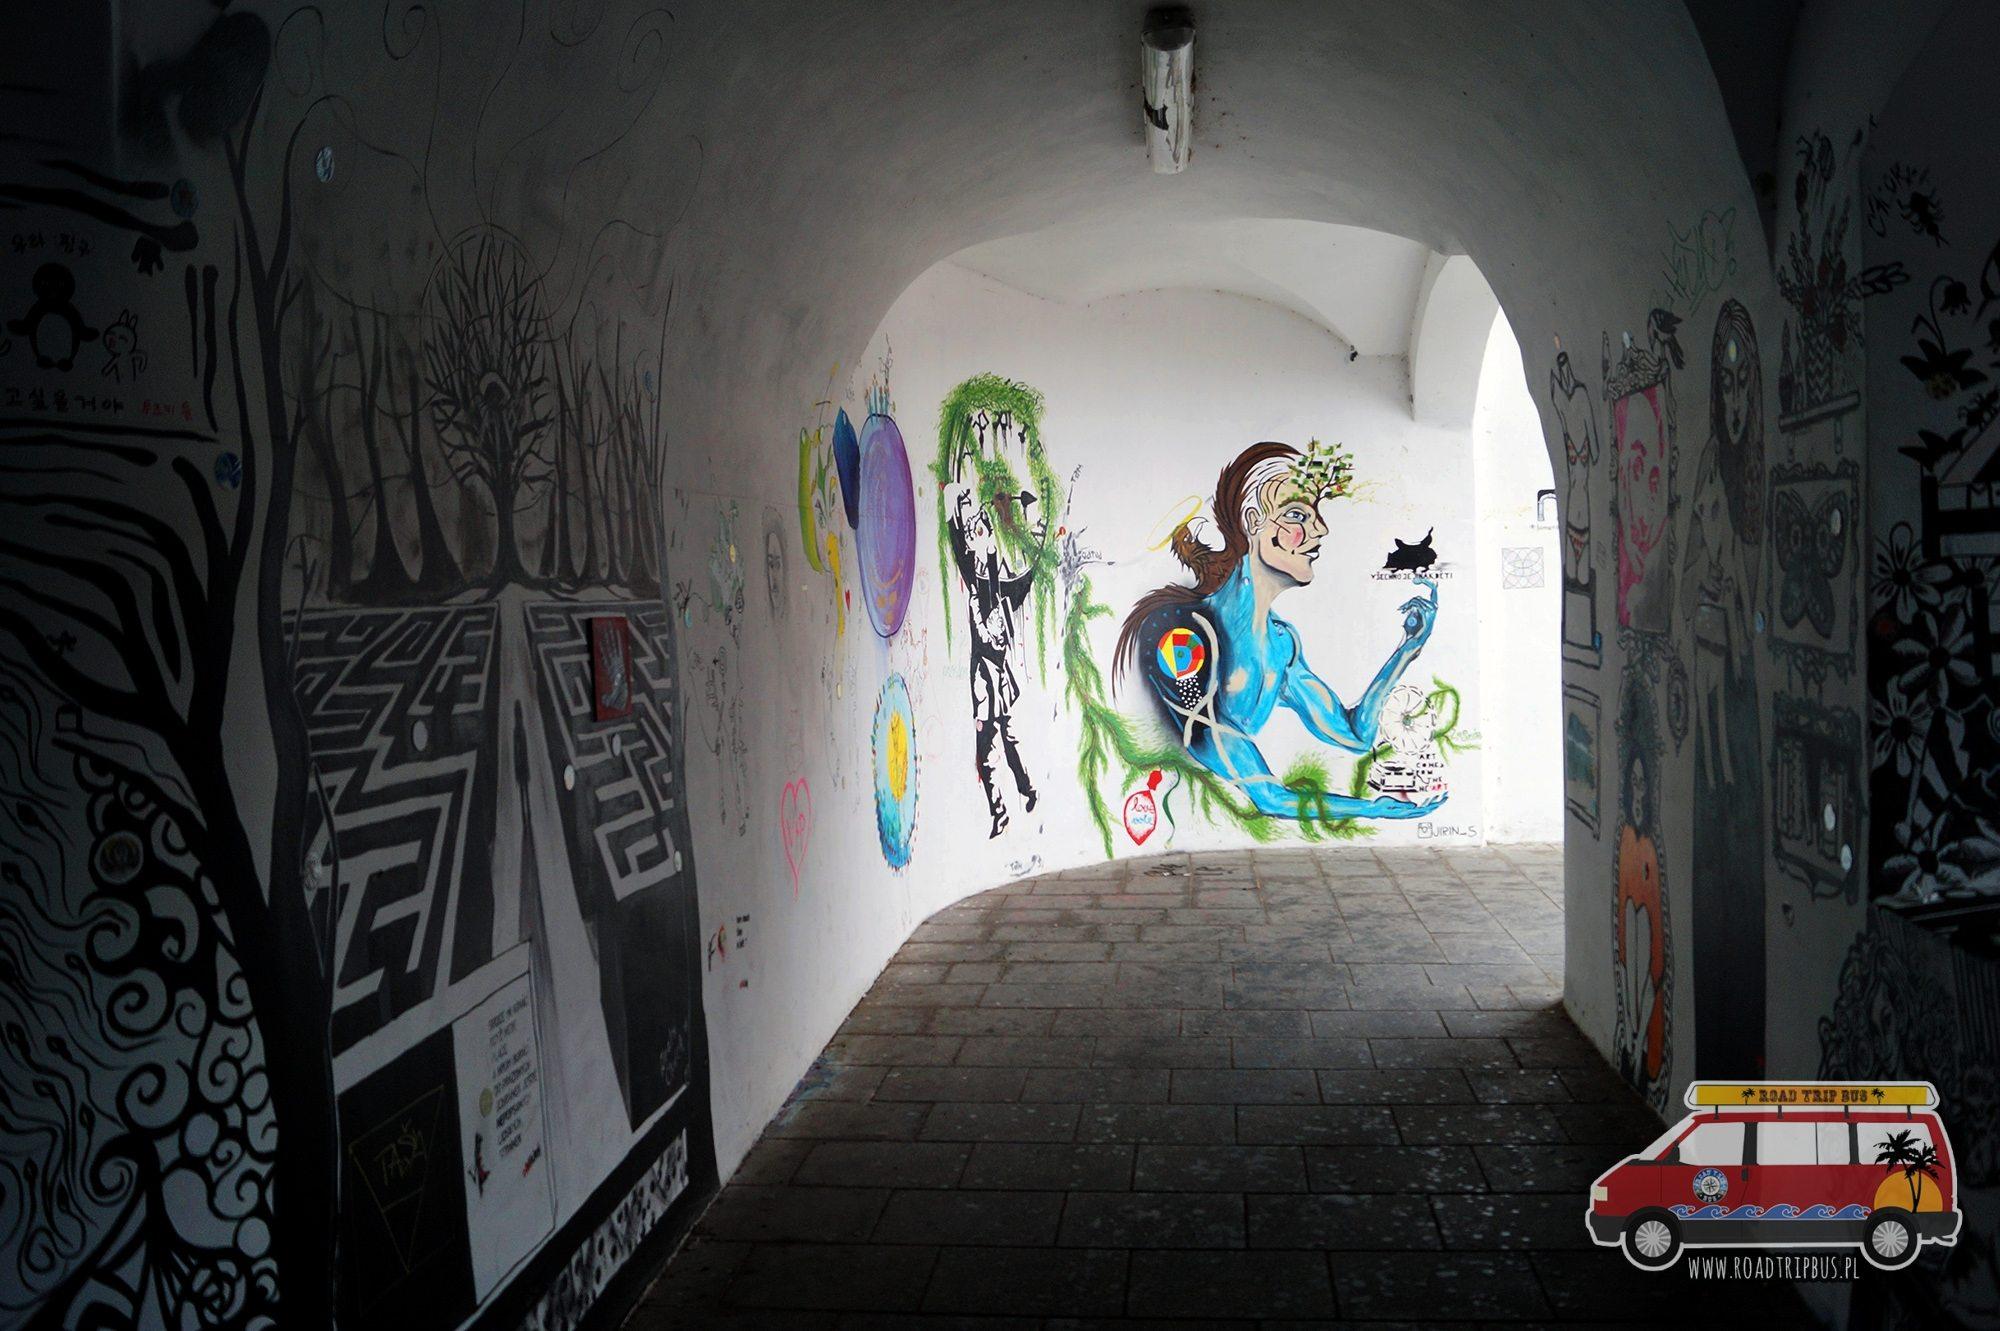 Lomena Gallery